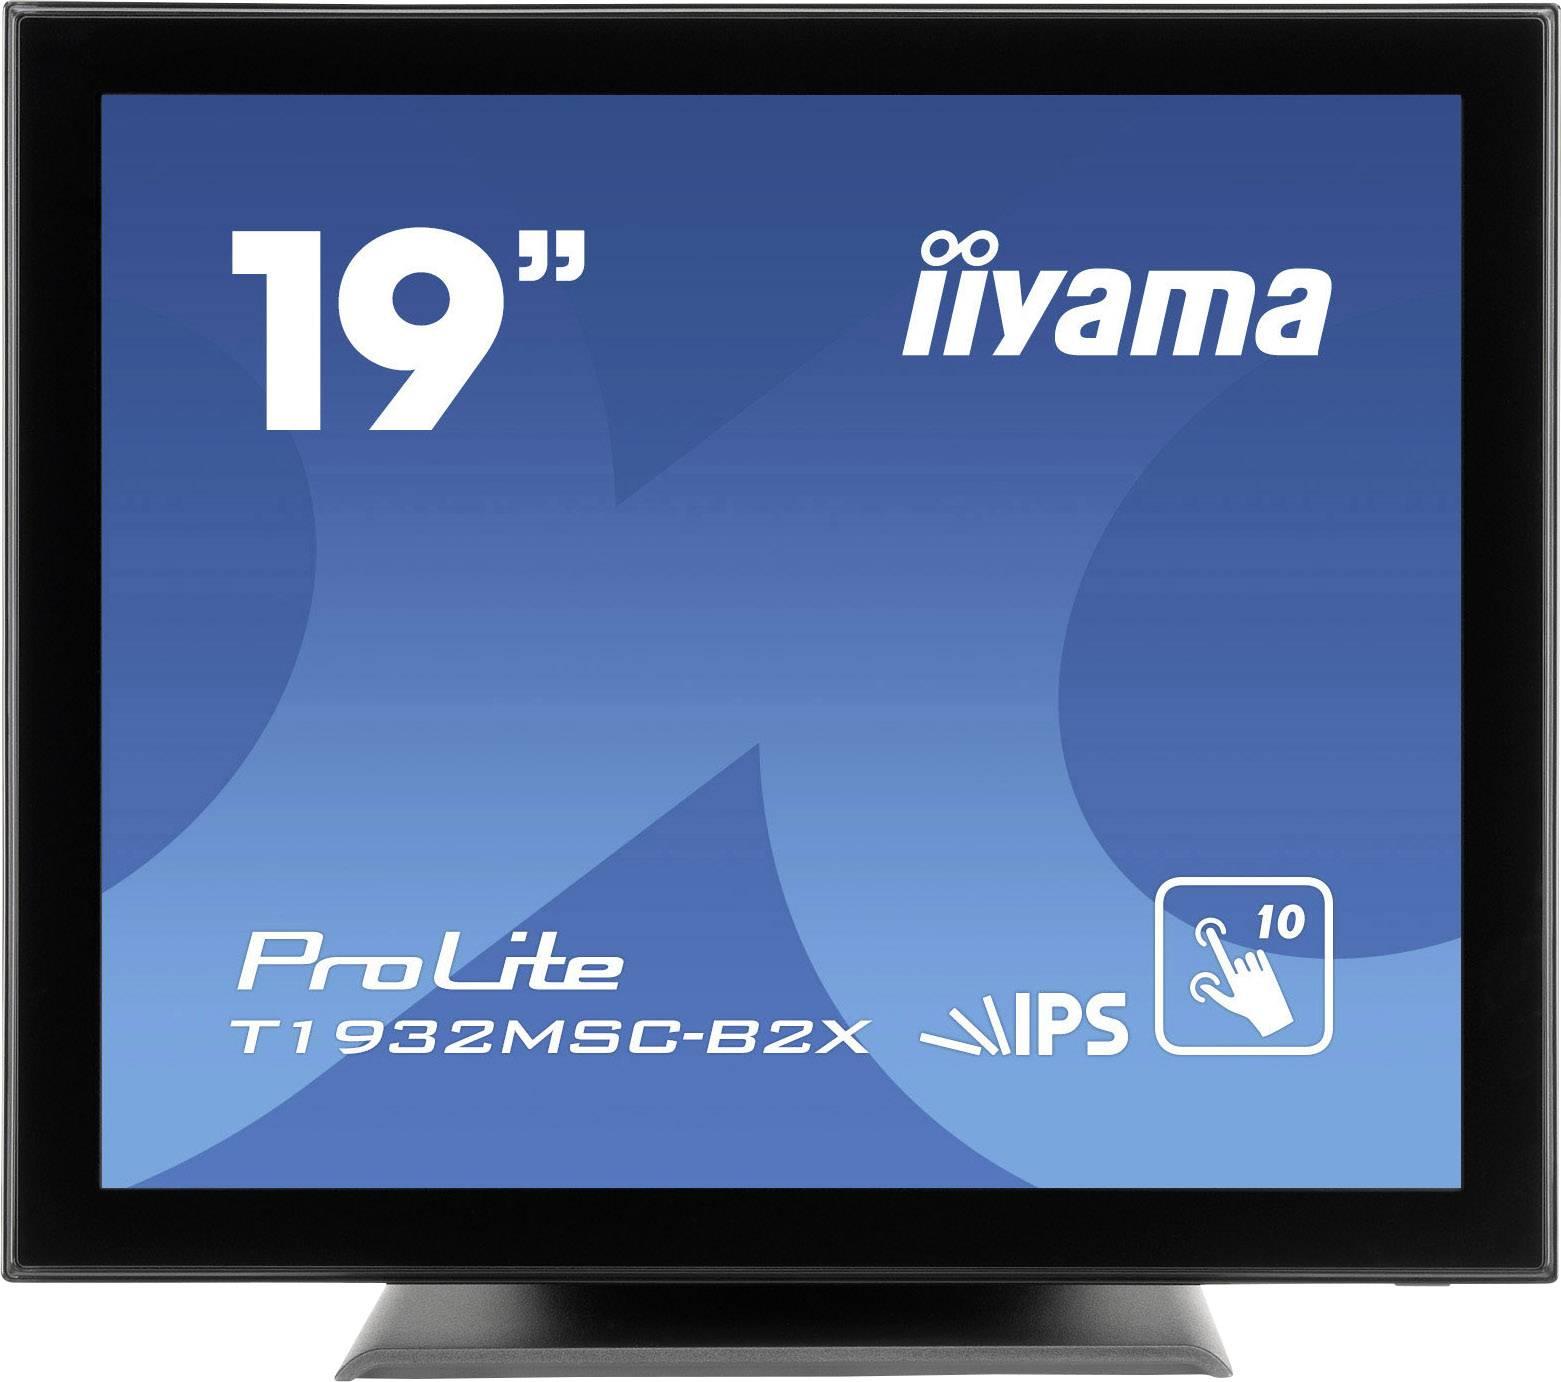 Iiyama T1932MSC-B2X Monitor touch s